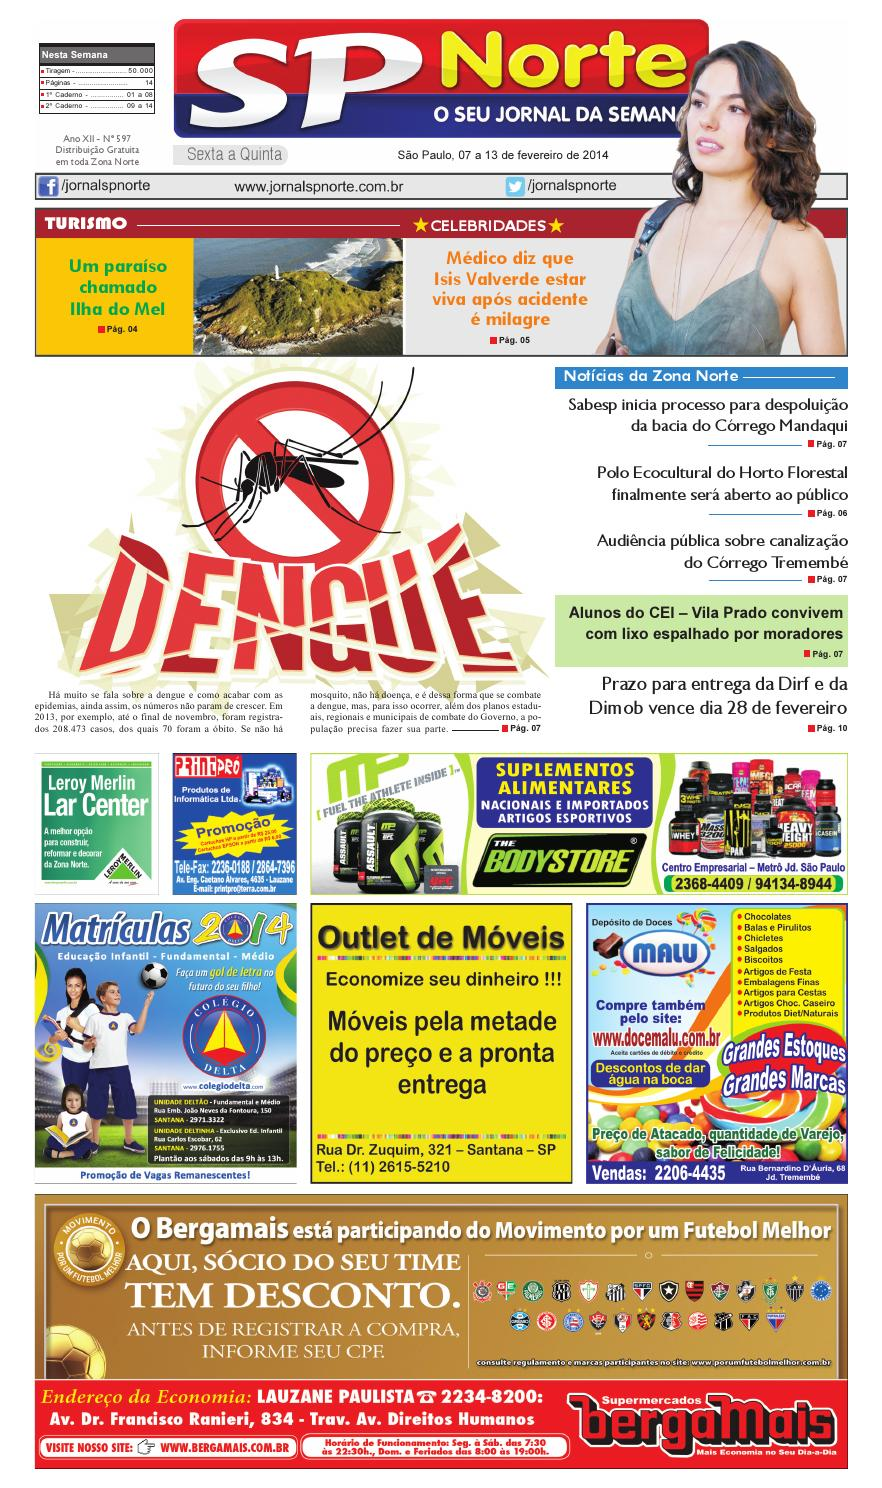 efac7852af53c Jornal SP Norte 597 by Grupo SP de jornais - issuu